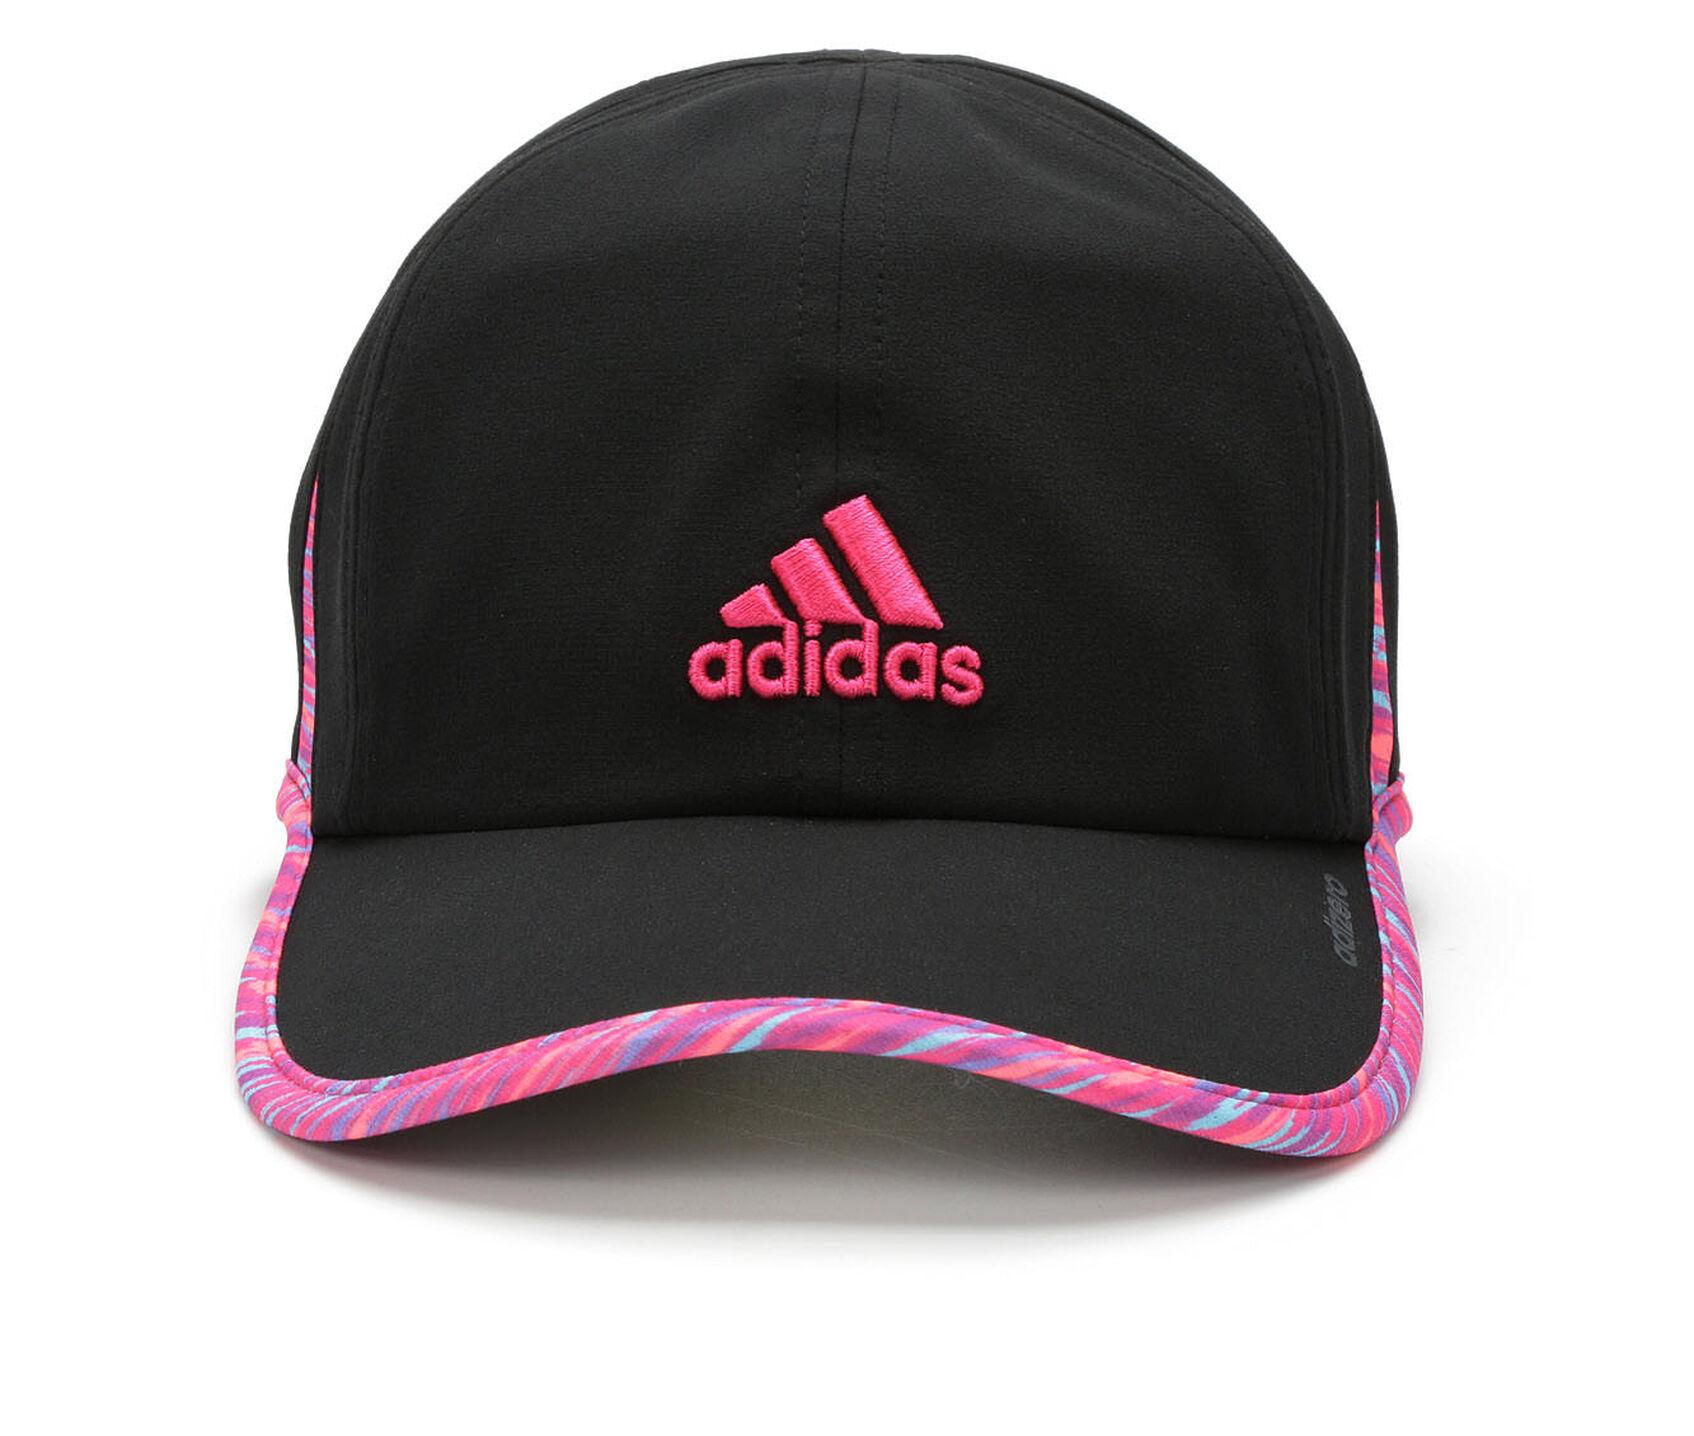 Adidas Adizero II Baseball Cap. Carousel Controls 4744885dc3d